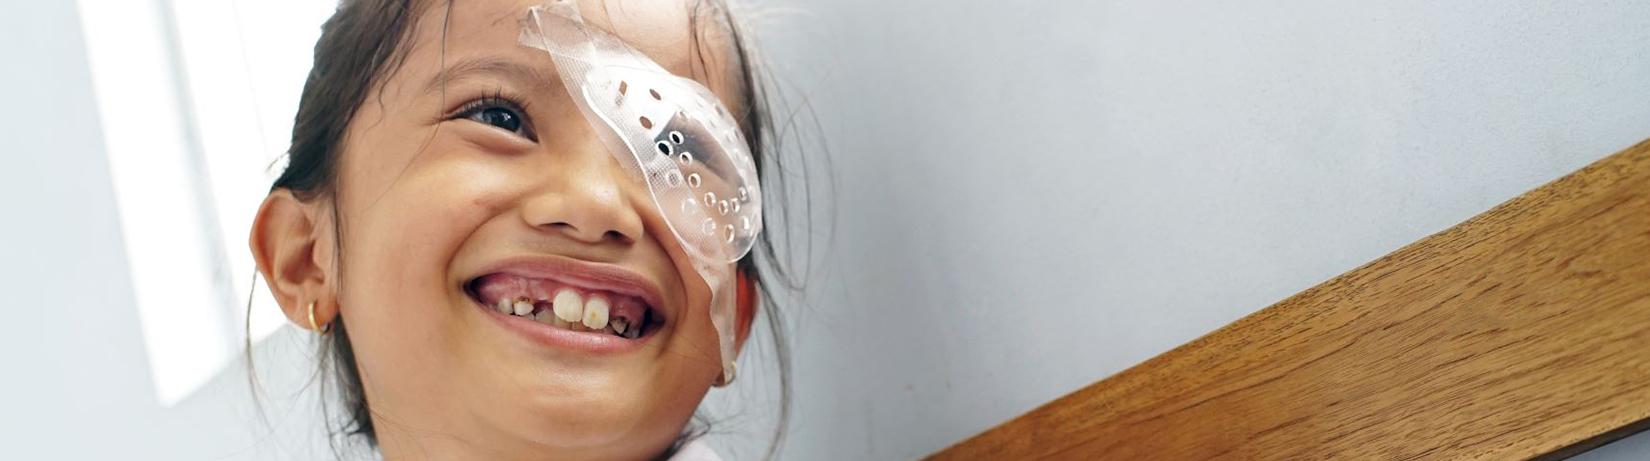 Young girl smiling, wearing eyepatch